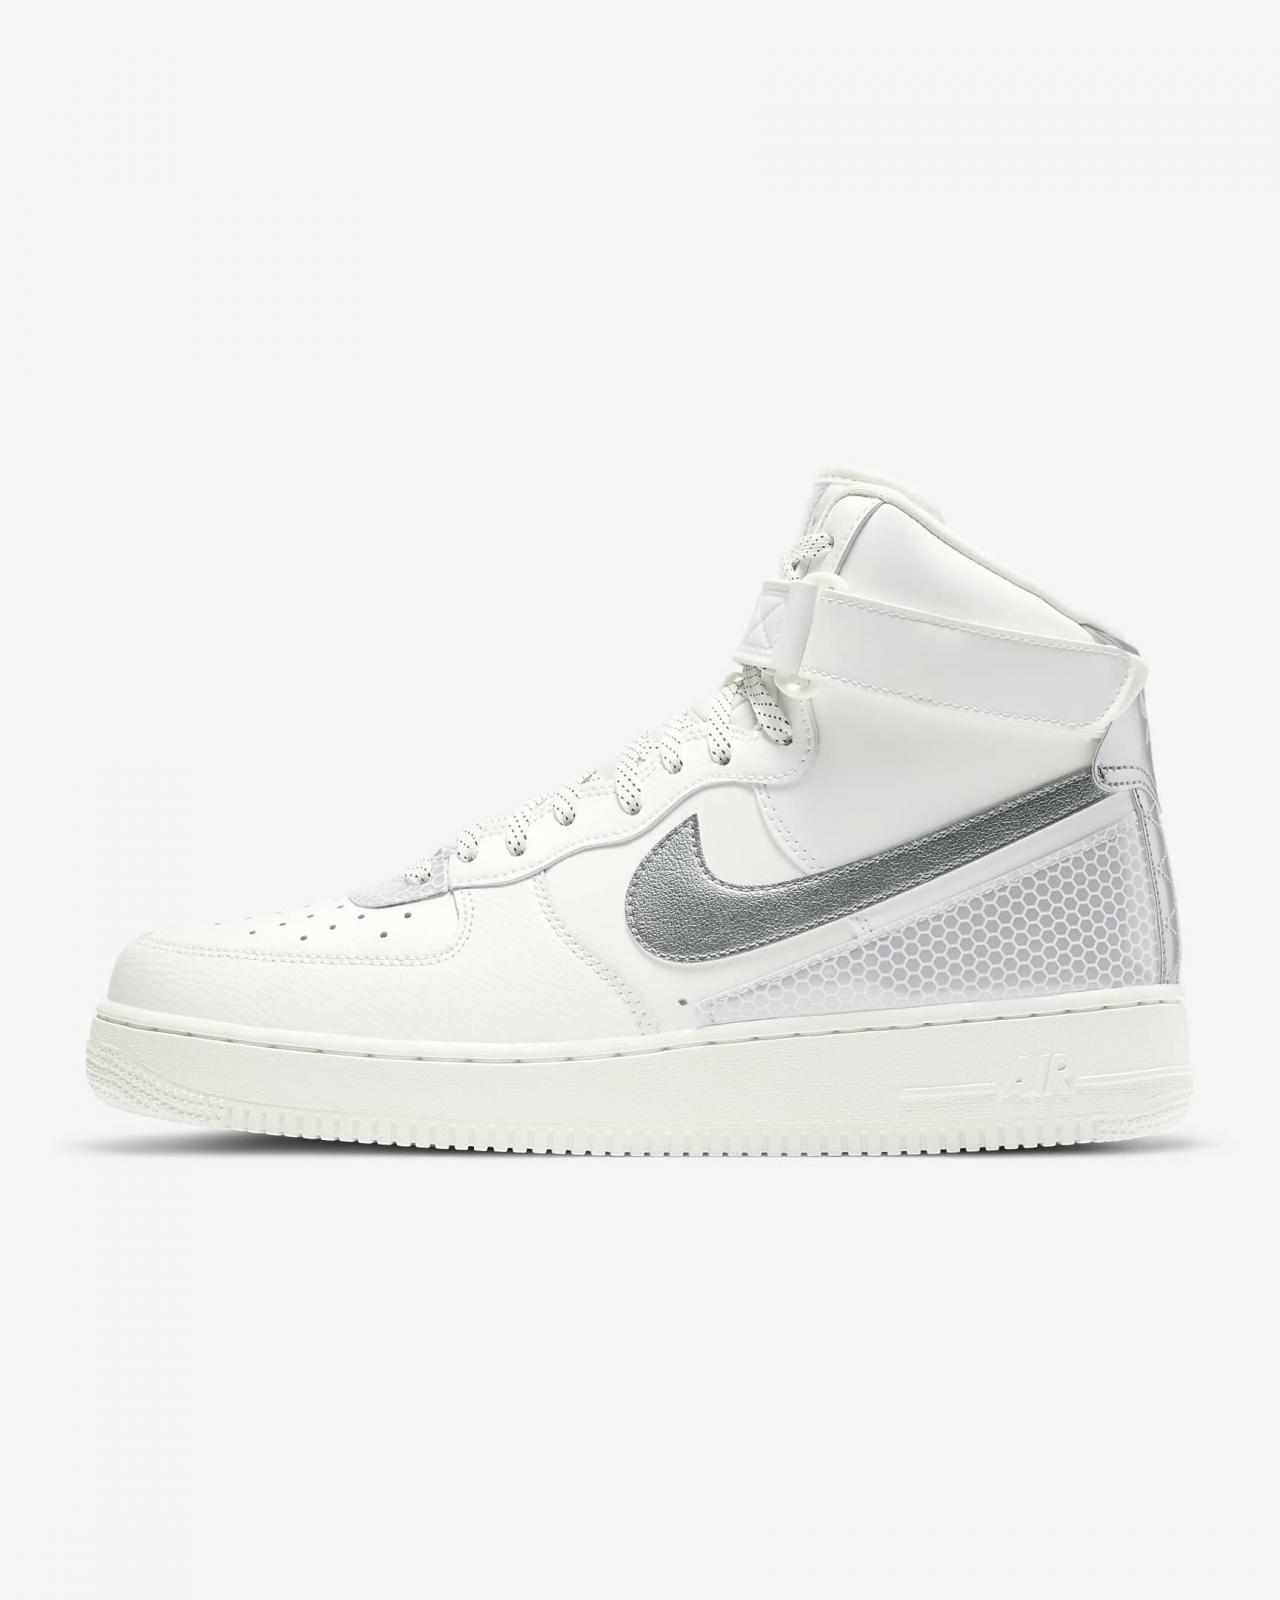 Nike Sportswear推出全新山峰白/黑/金属银色Air Force 1 High 3M